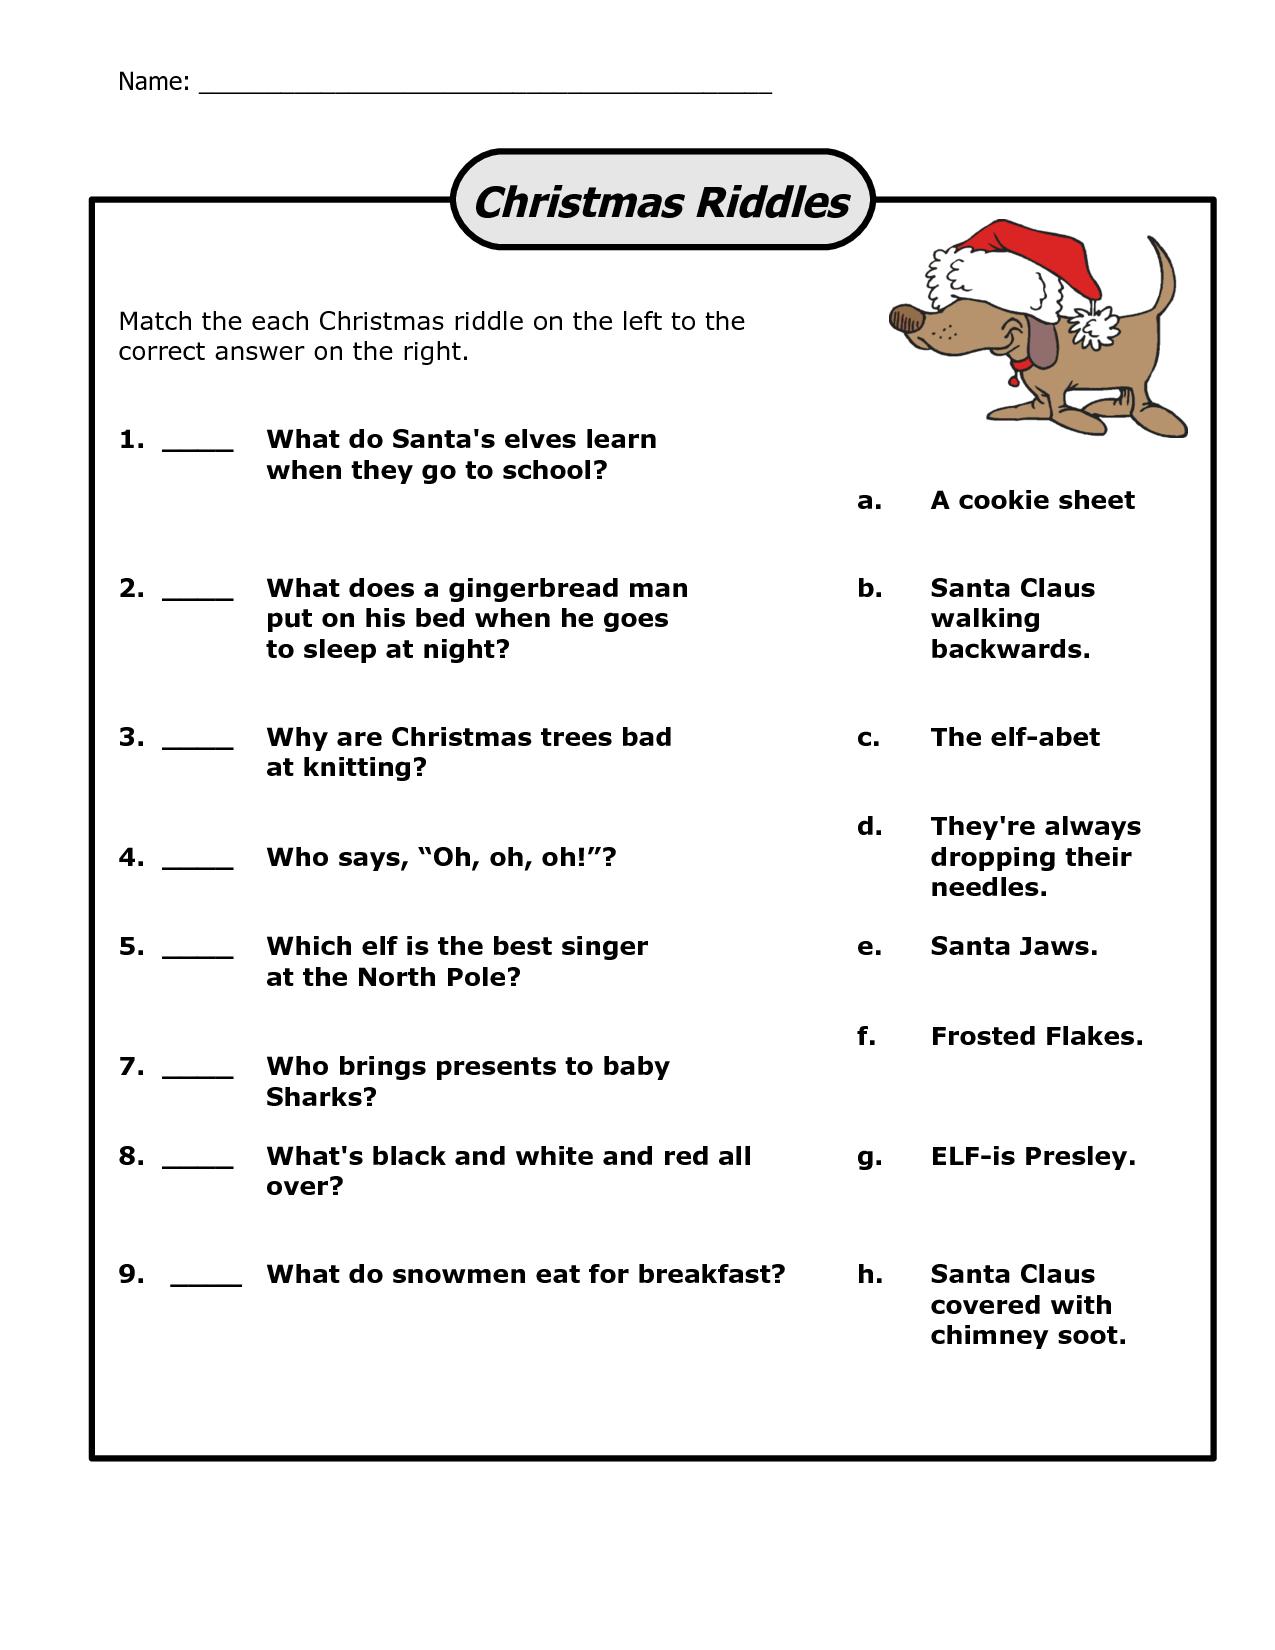 Funny Christmas Riddles | Christmas | Christmas Riddles, Christmas - Free Printable Christmas Riddle Games